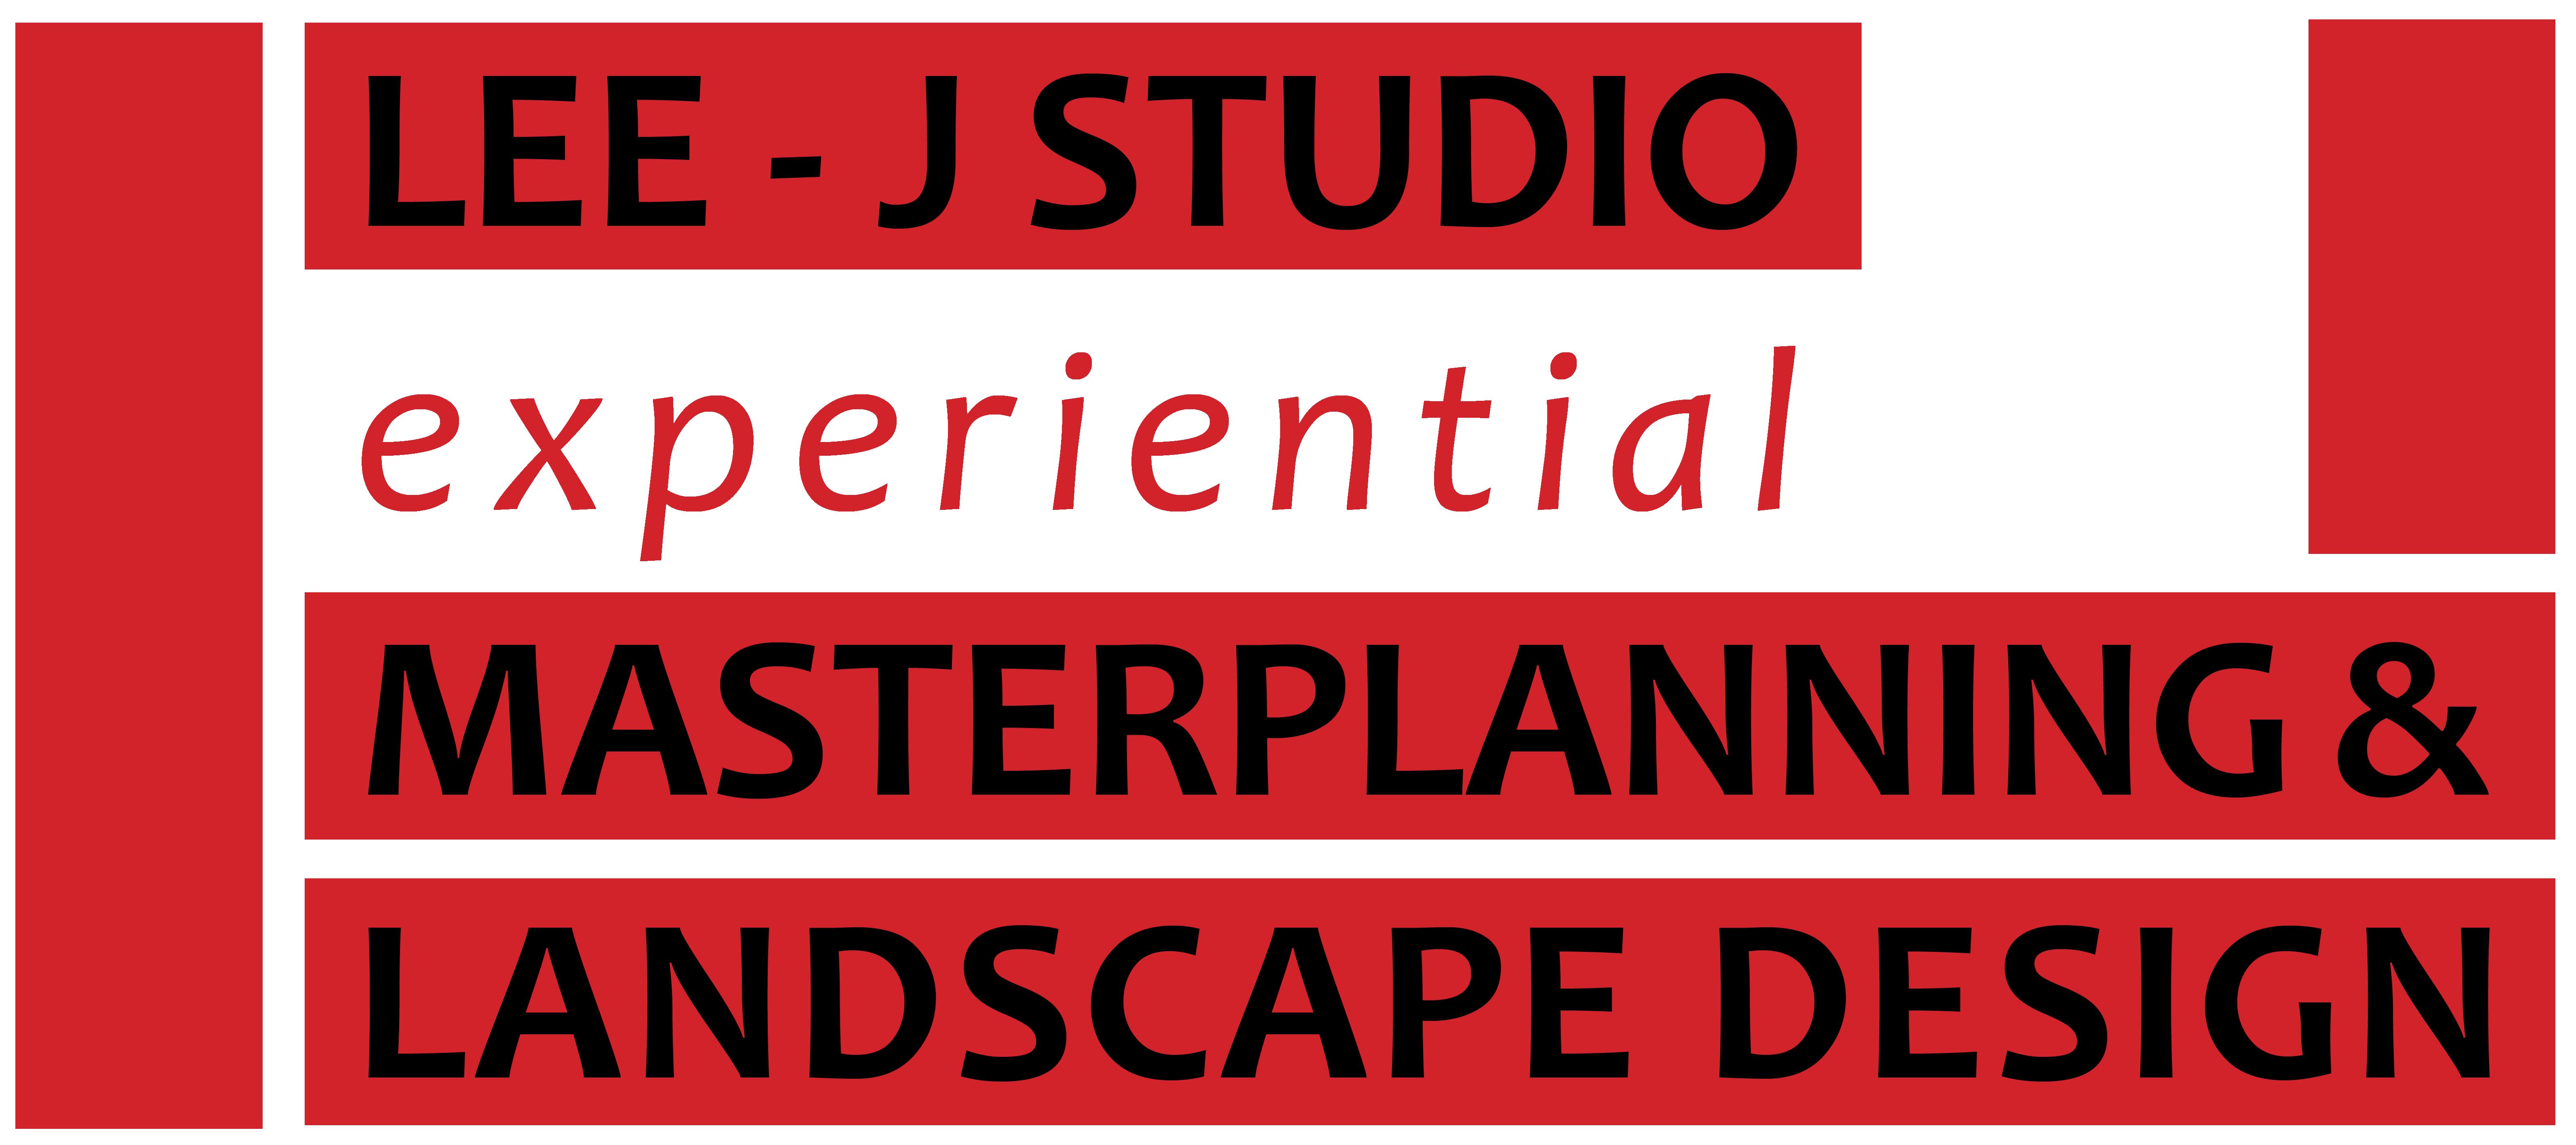 Lee-J Studio